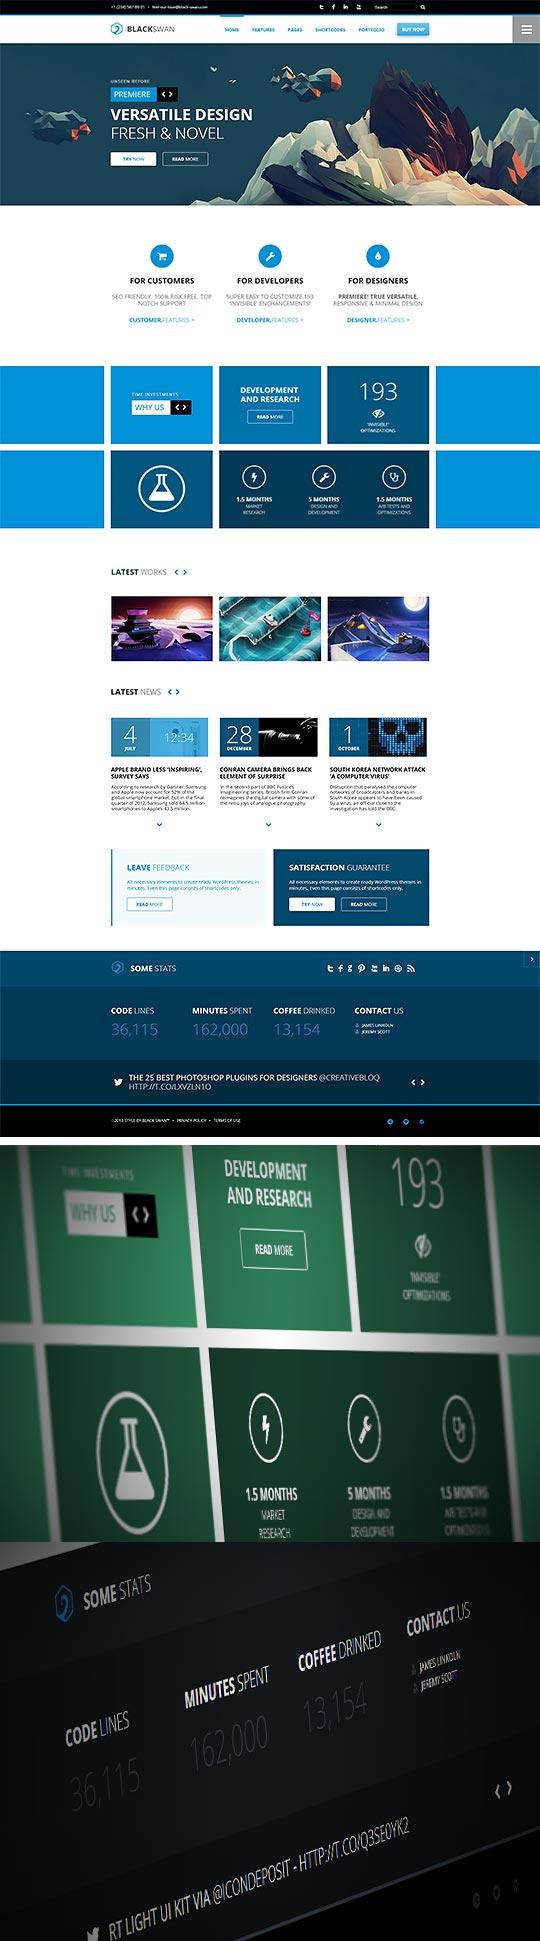 BlackSwan #WordPress theme - #flat #versatile #design